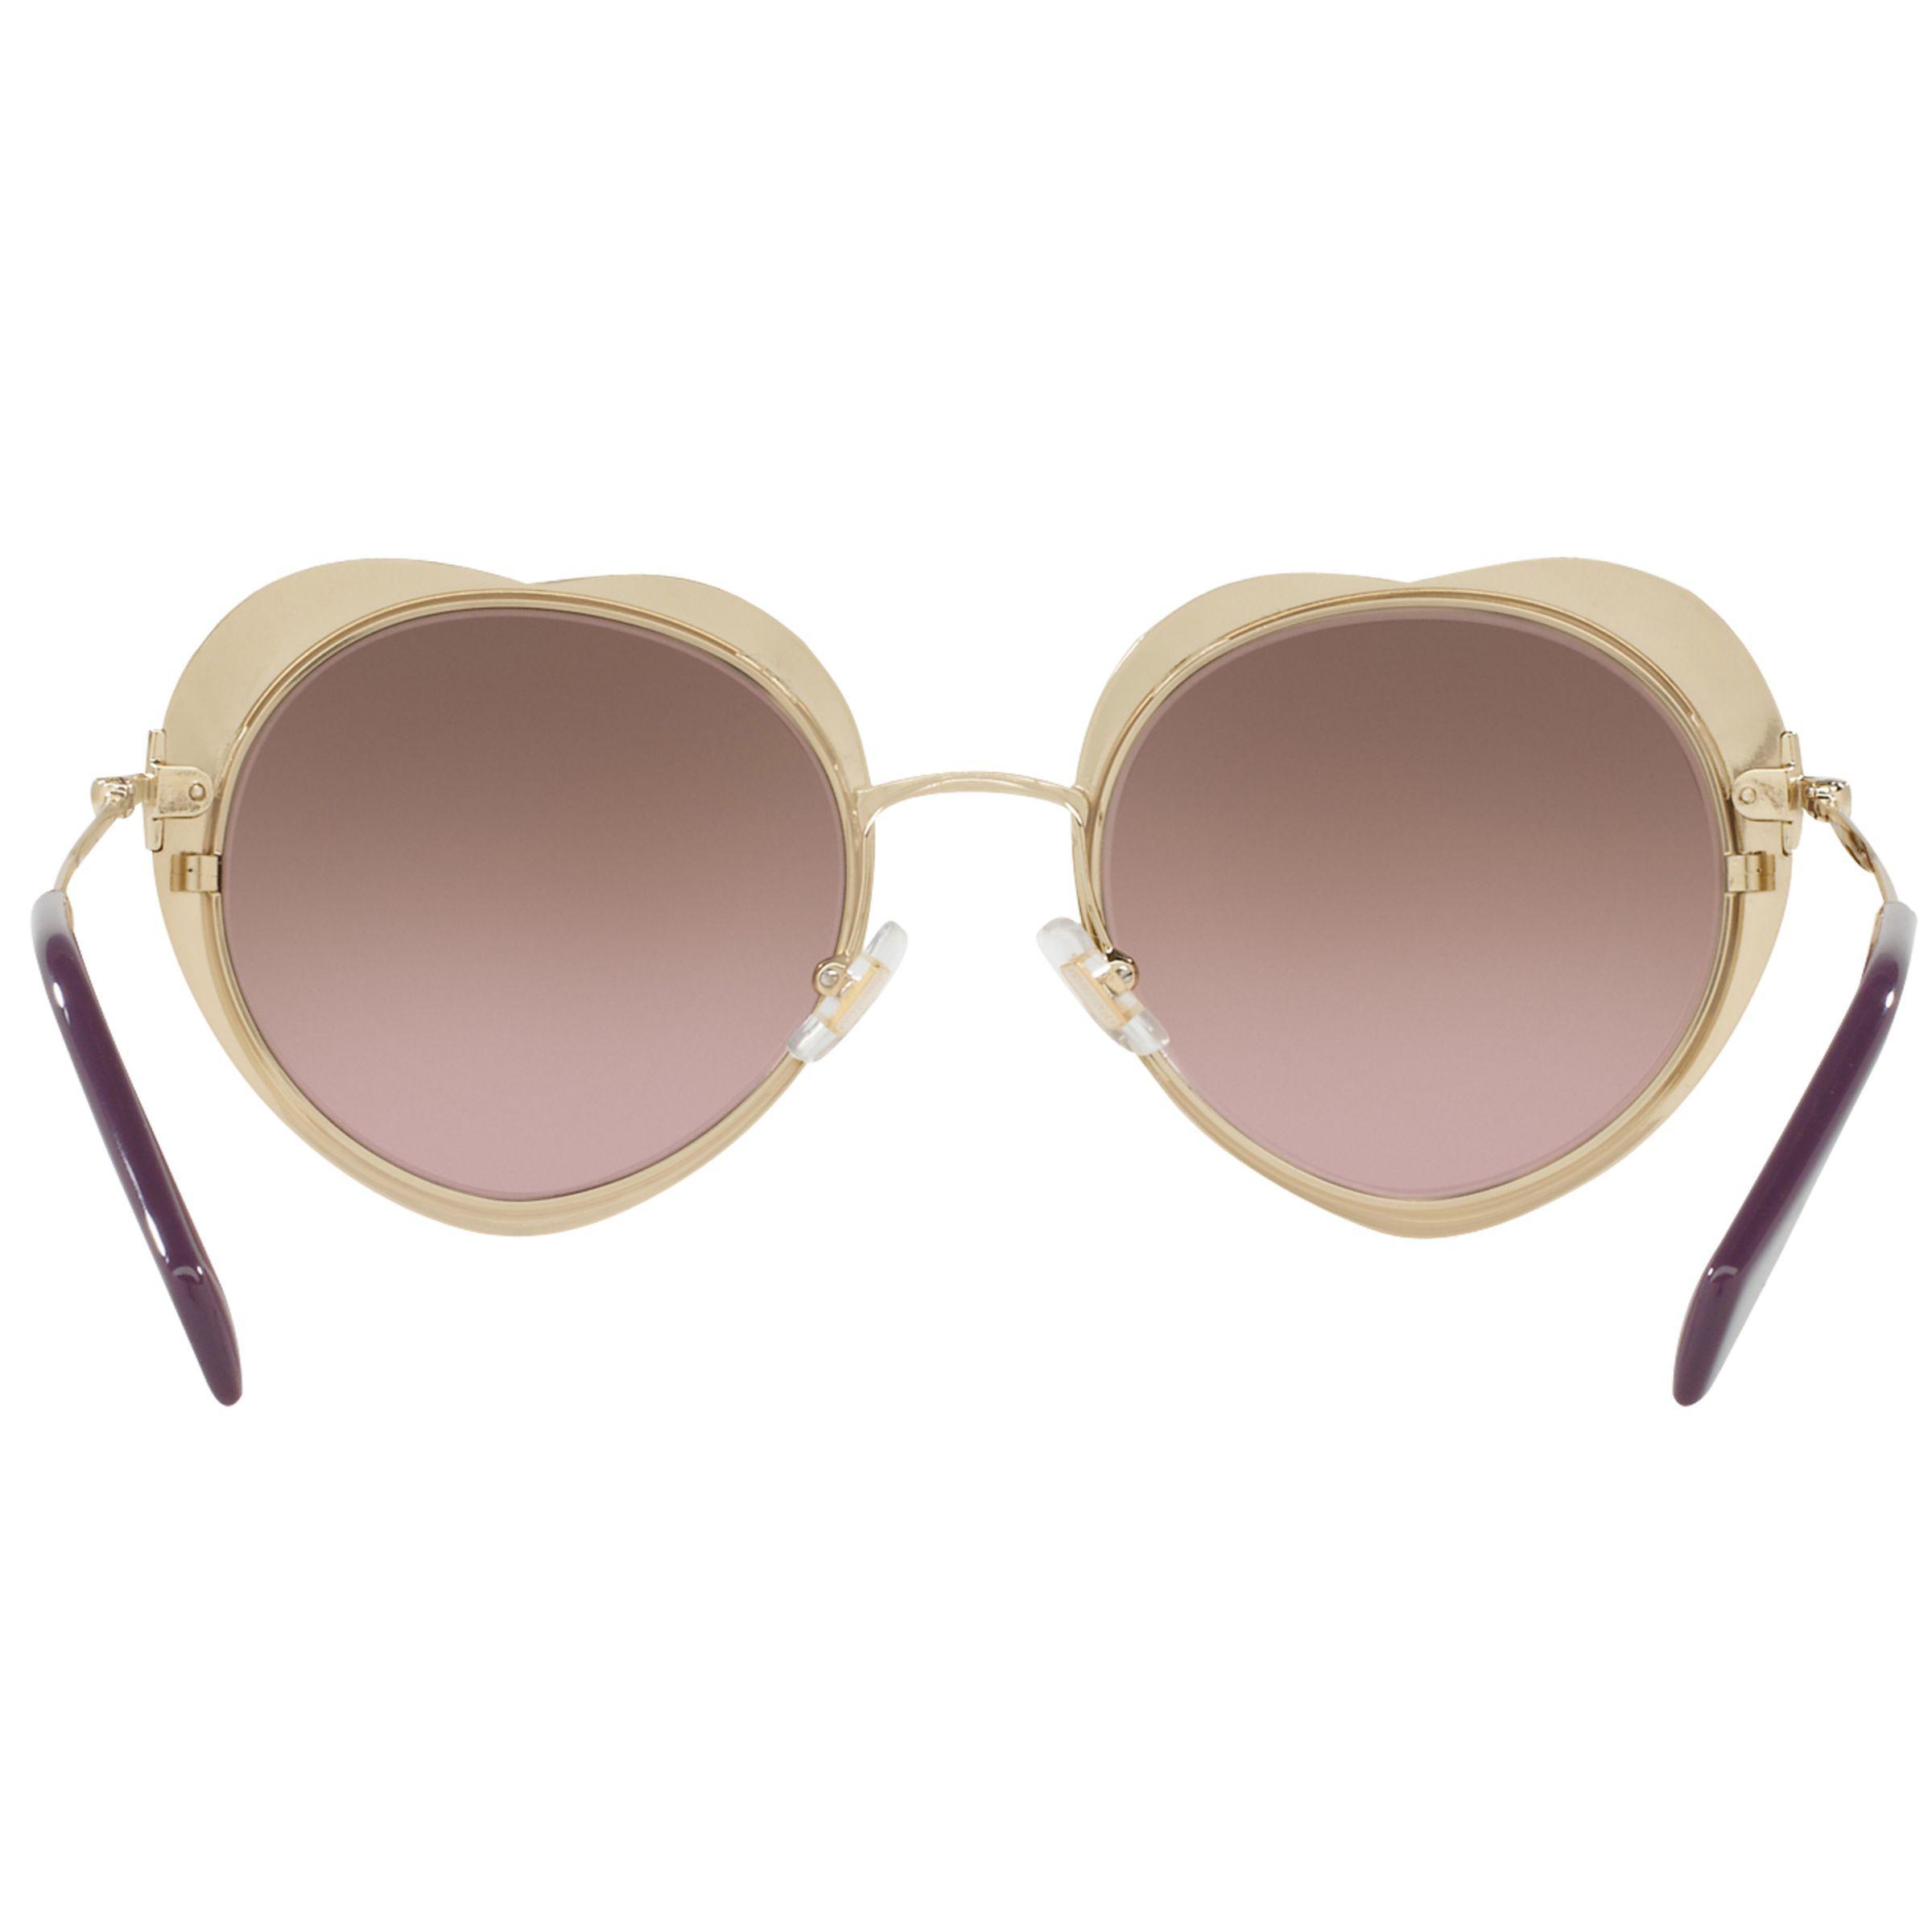 5693b8babf Miu Miu Mu 54rs Oval Sunglasses in Metallic - Lyst